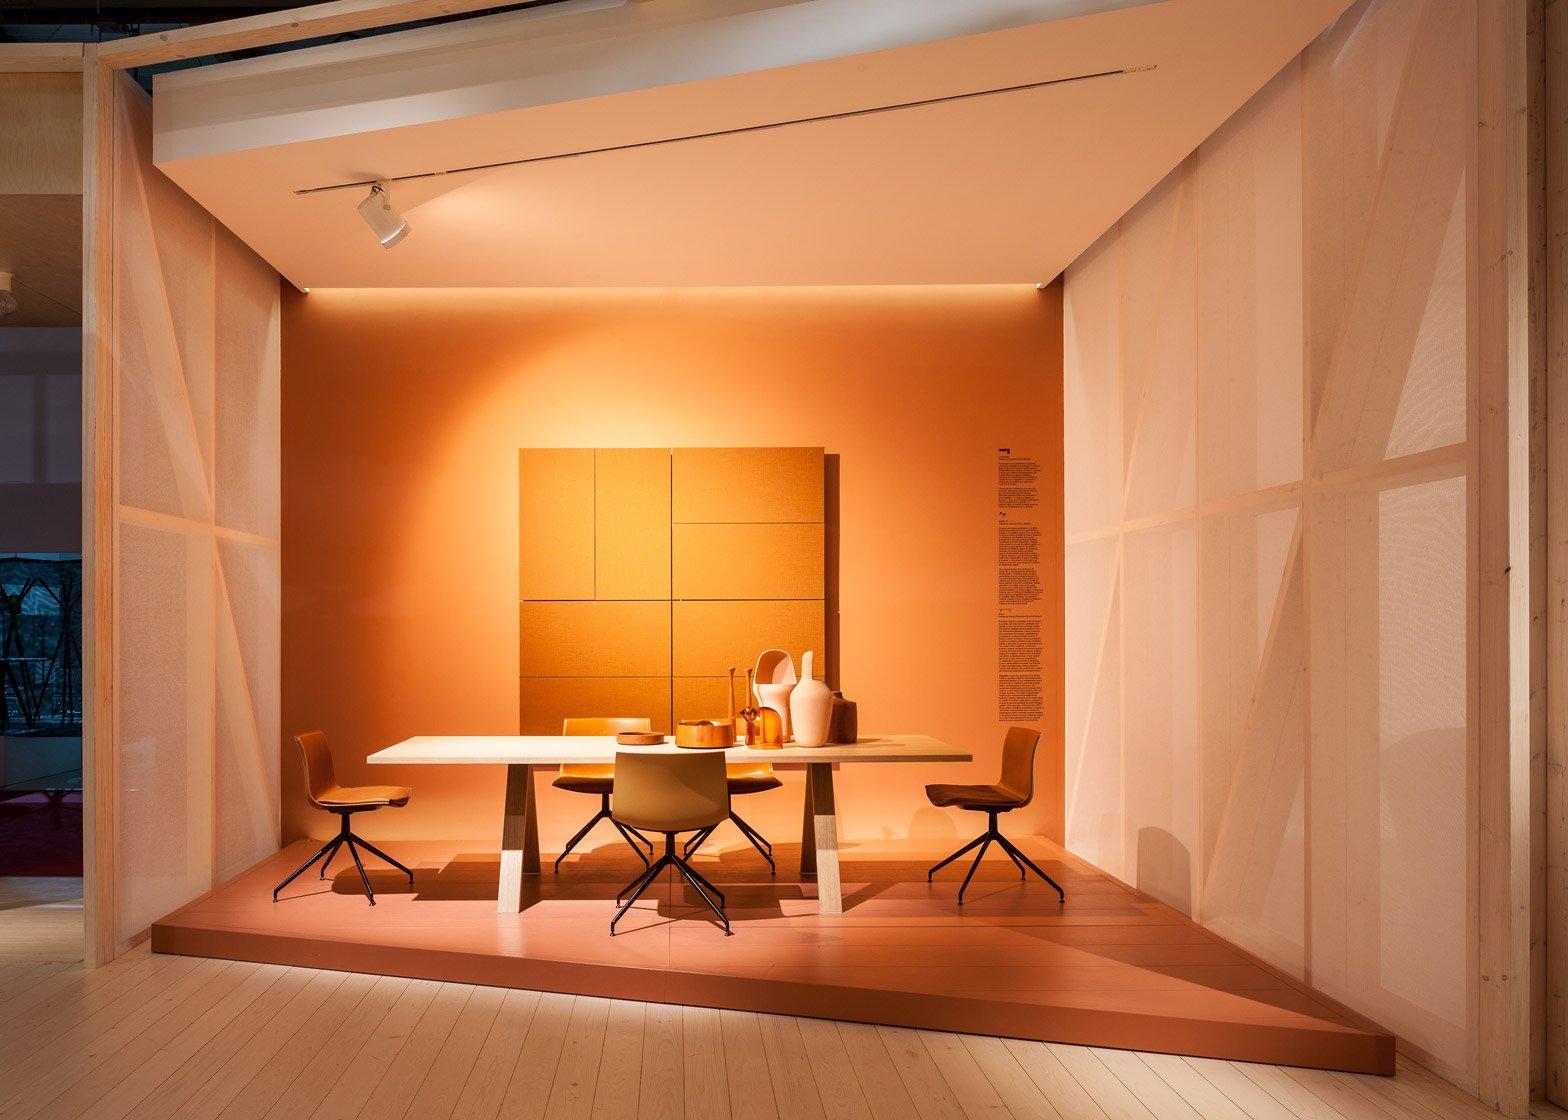 Arper furniture exhibition design for Milan Design Week 2016